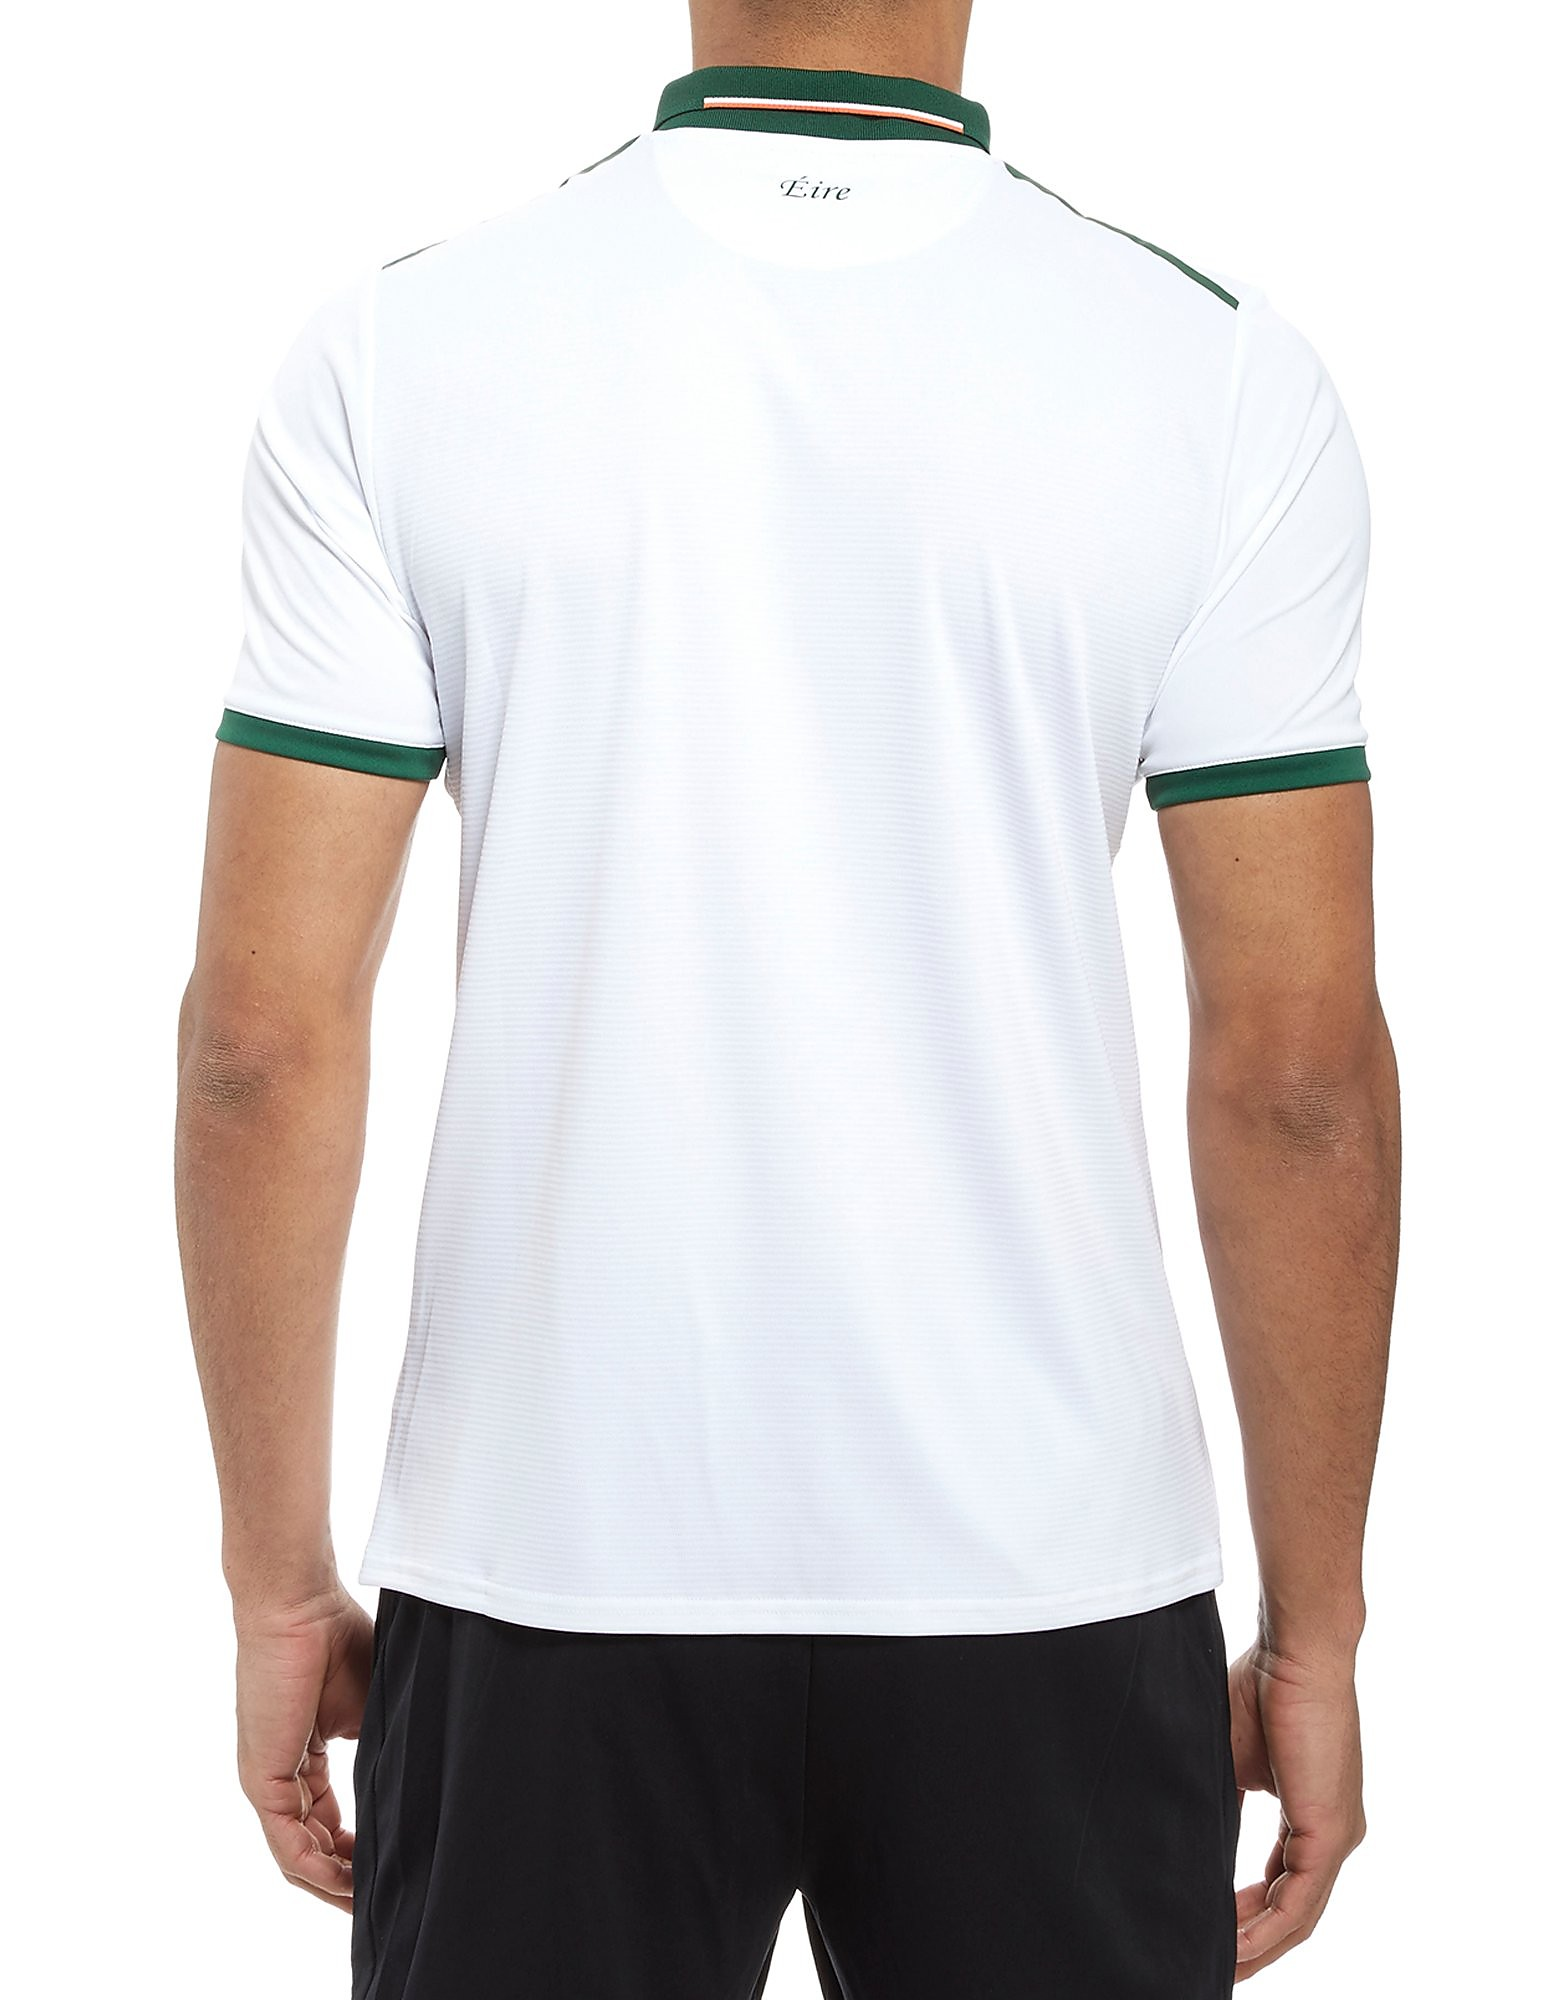 New Balance Republic of Ireland Away Shirt